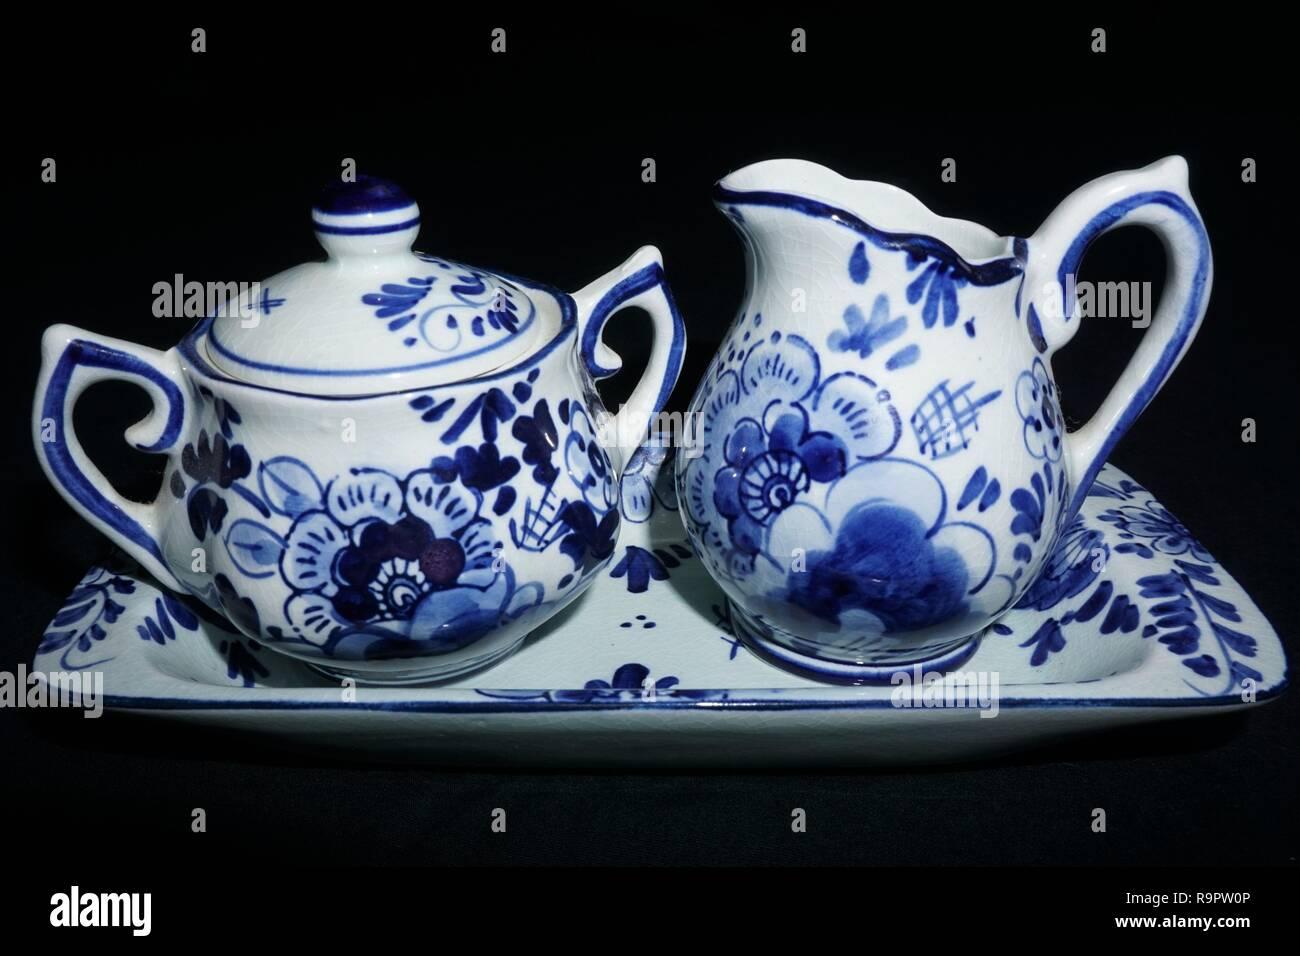 Delft Art Pottery Precise Vintage Delft Blue Holland Dutch Tea Light Children Holding Hands